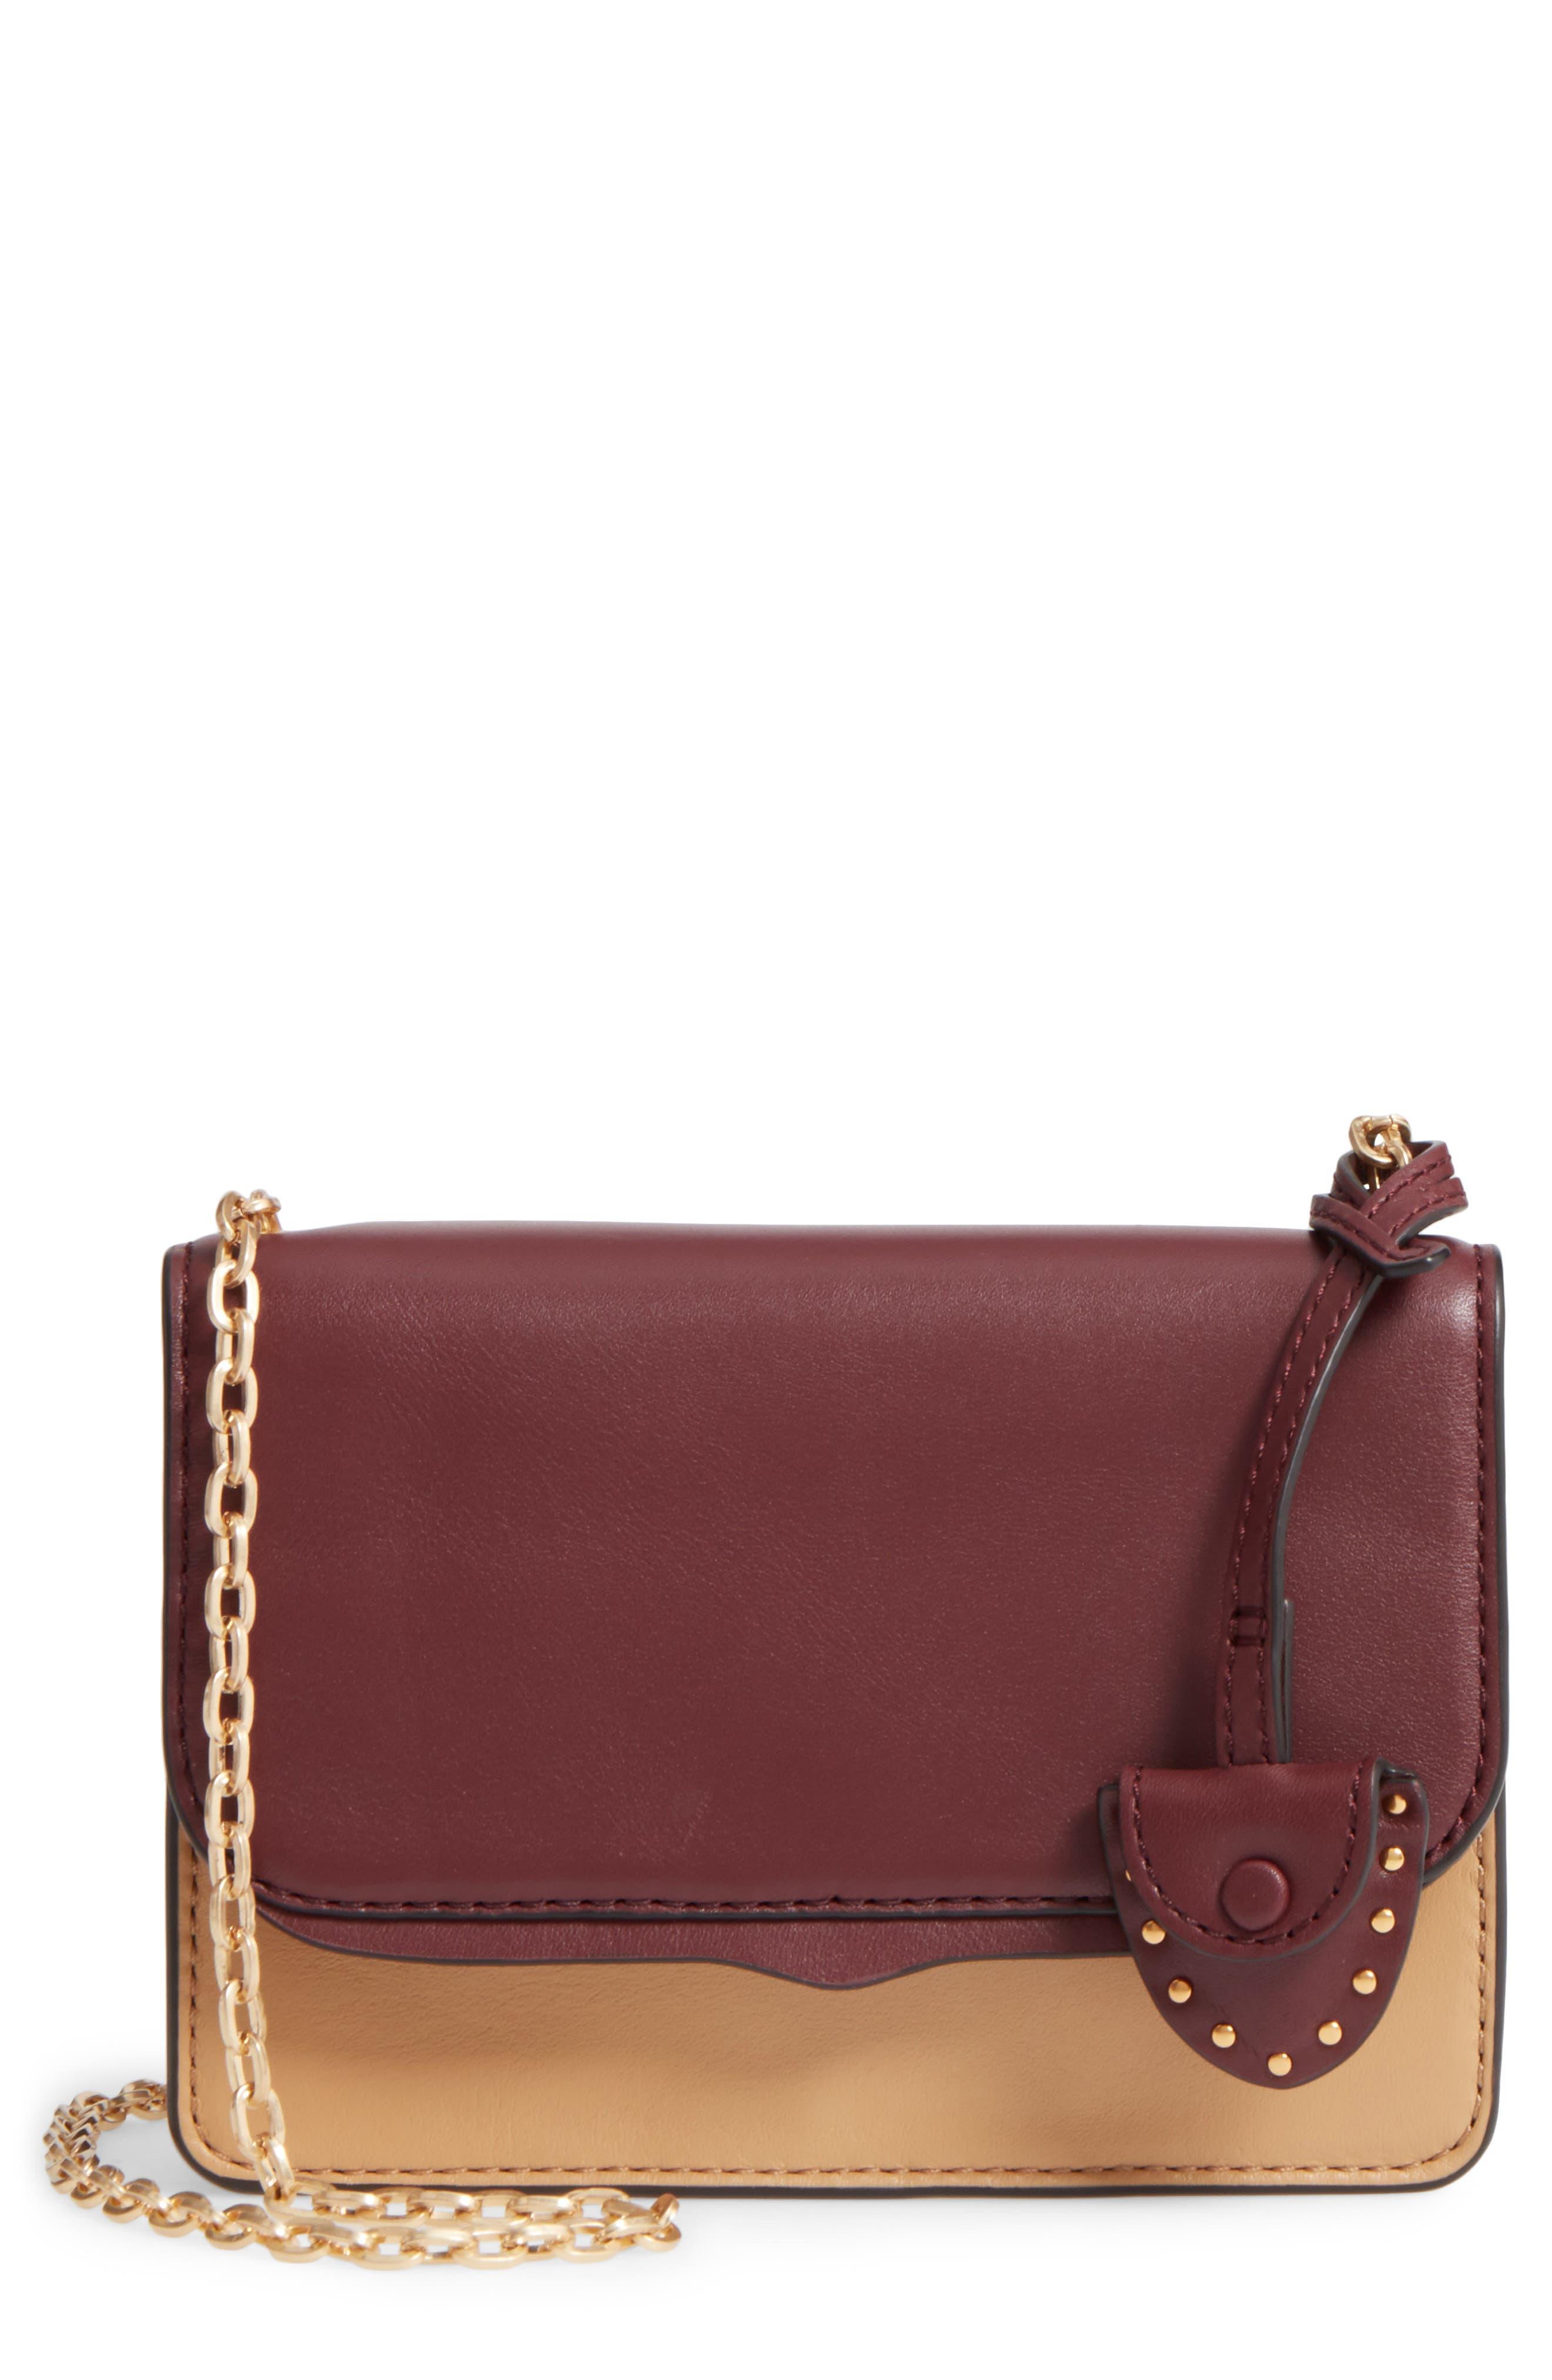 Rebecca Minkoff Mini Chain Leather Crossbody Bag